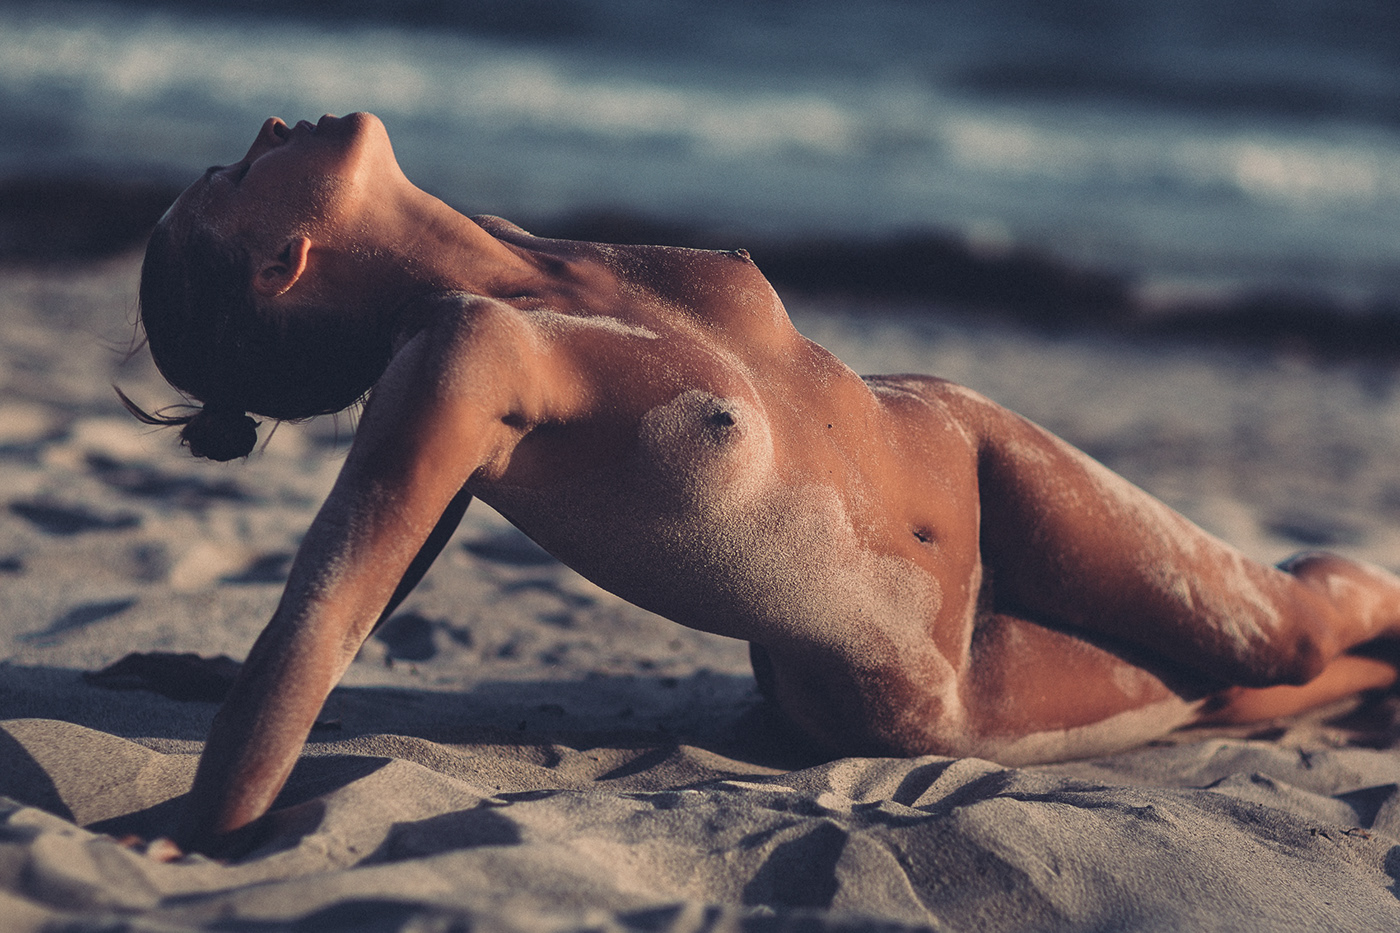 Tan marisa nude — photo 12